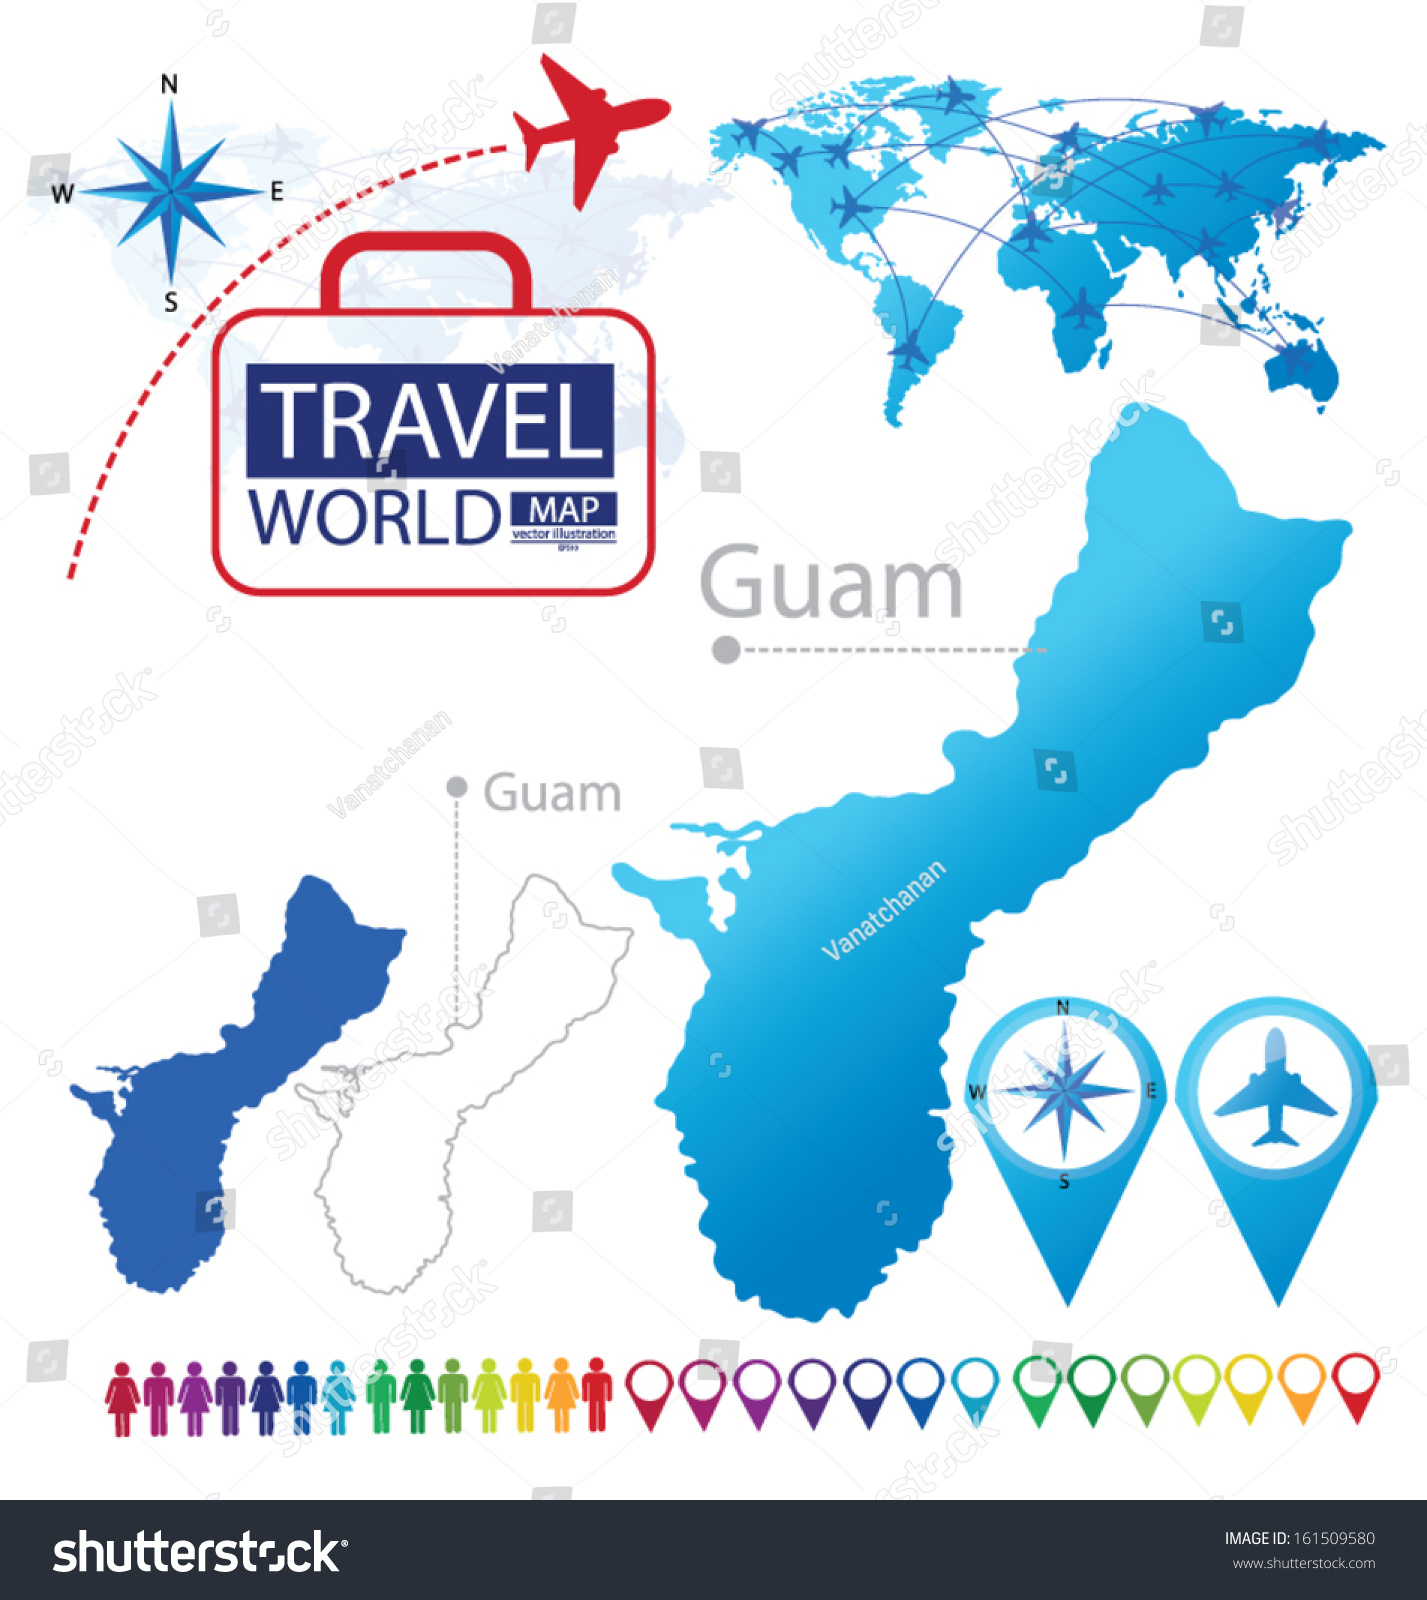 Guam world map travel vector illustration stock vector 161509580 guam world map travel vector illustration stock vector 161509580 shutterstock gumiabroncs Choice Image